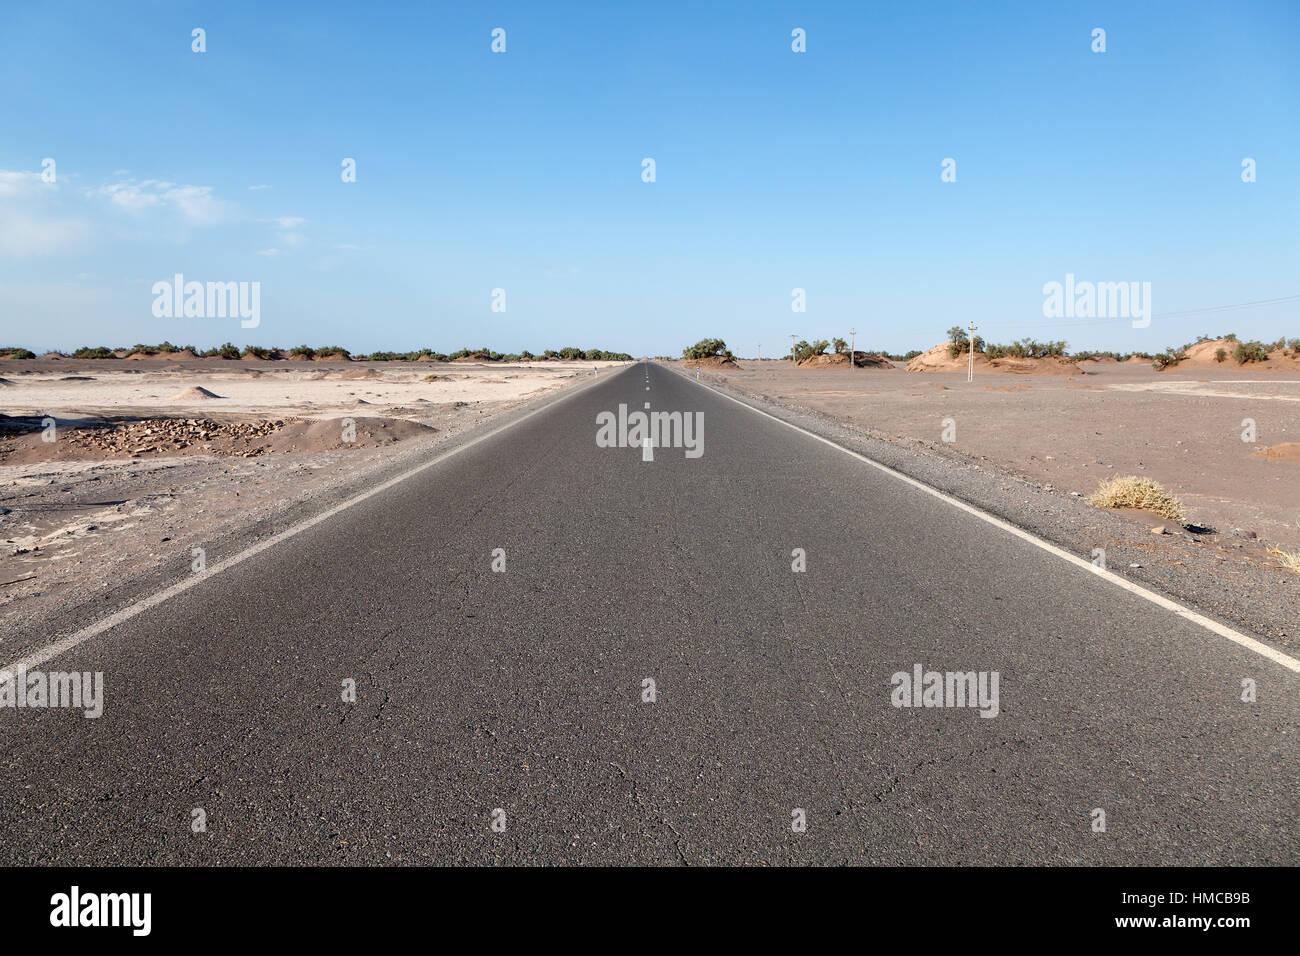 Empty road through Dasht-e Loot desert, Iran - Stock Image